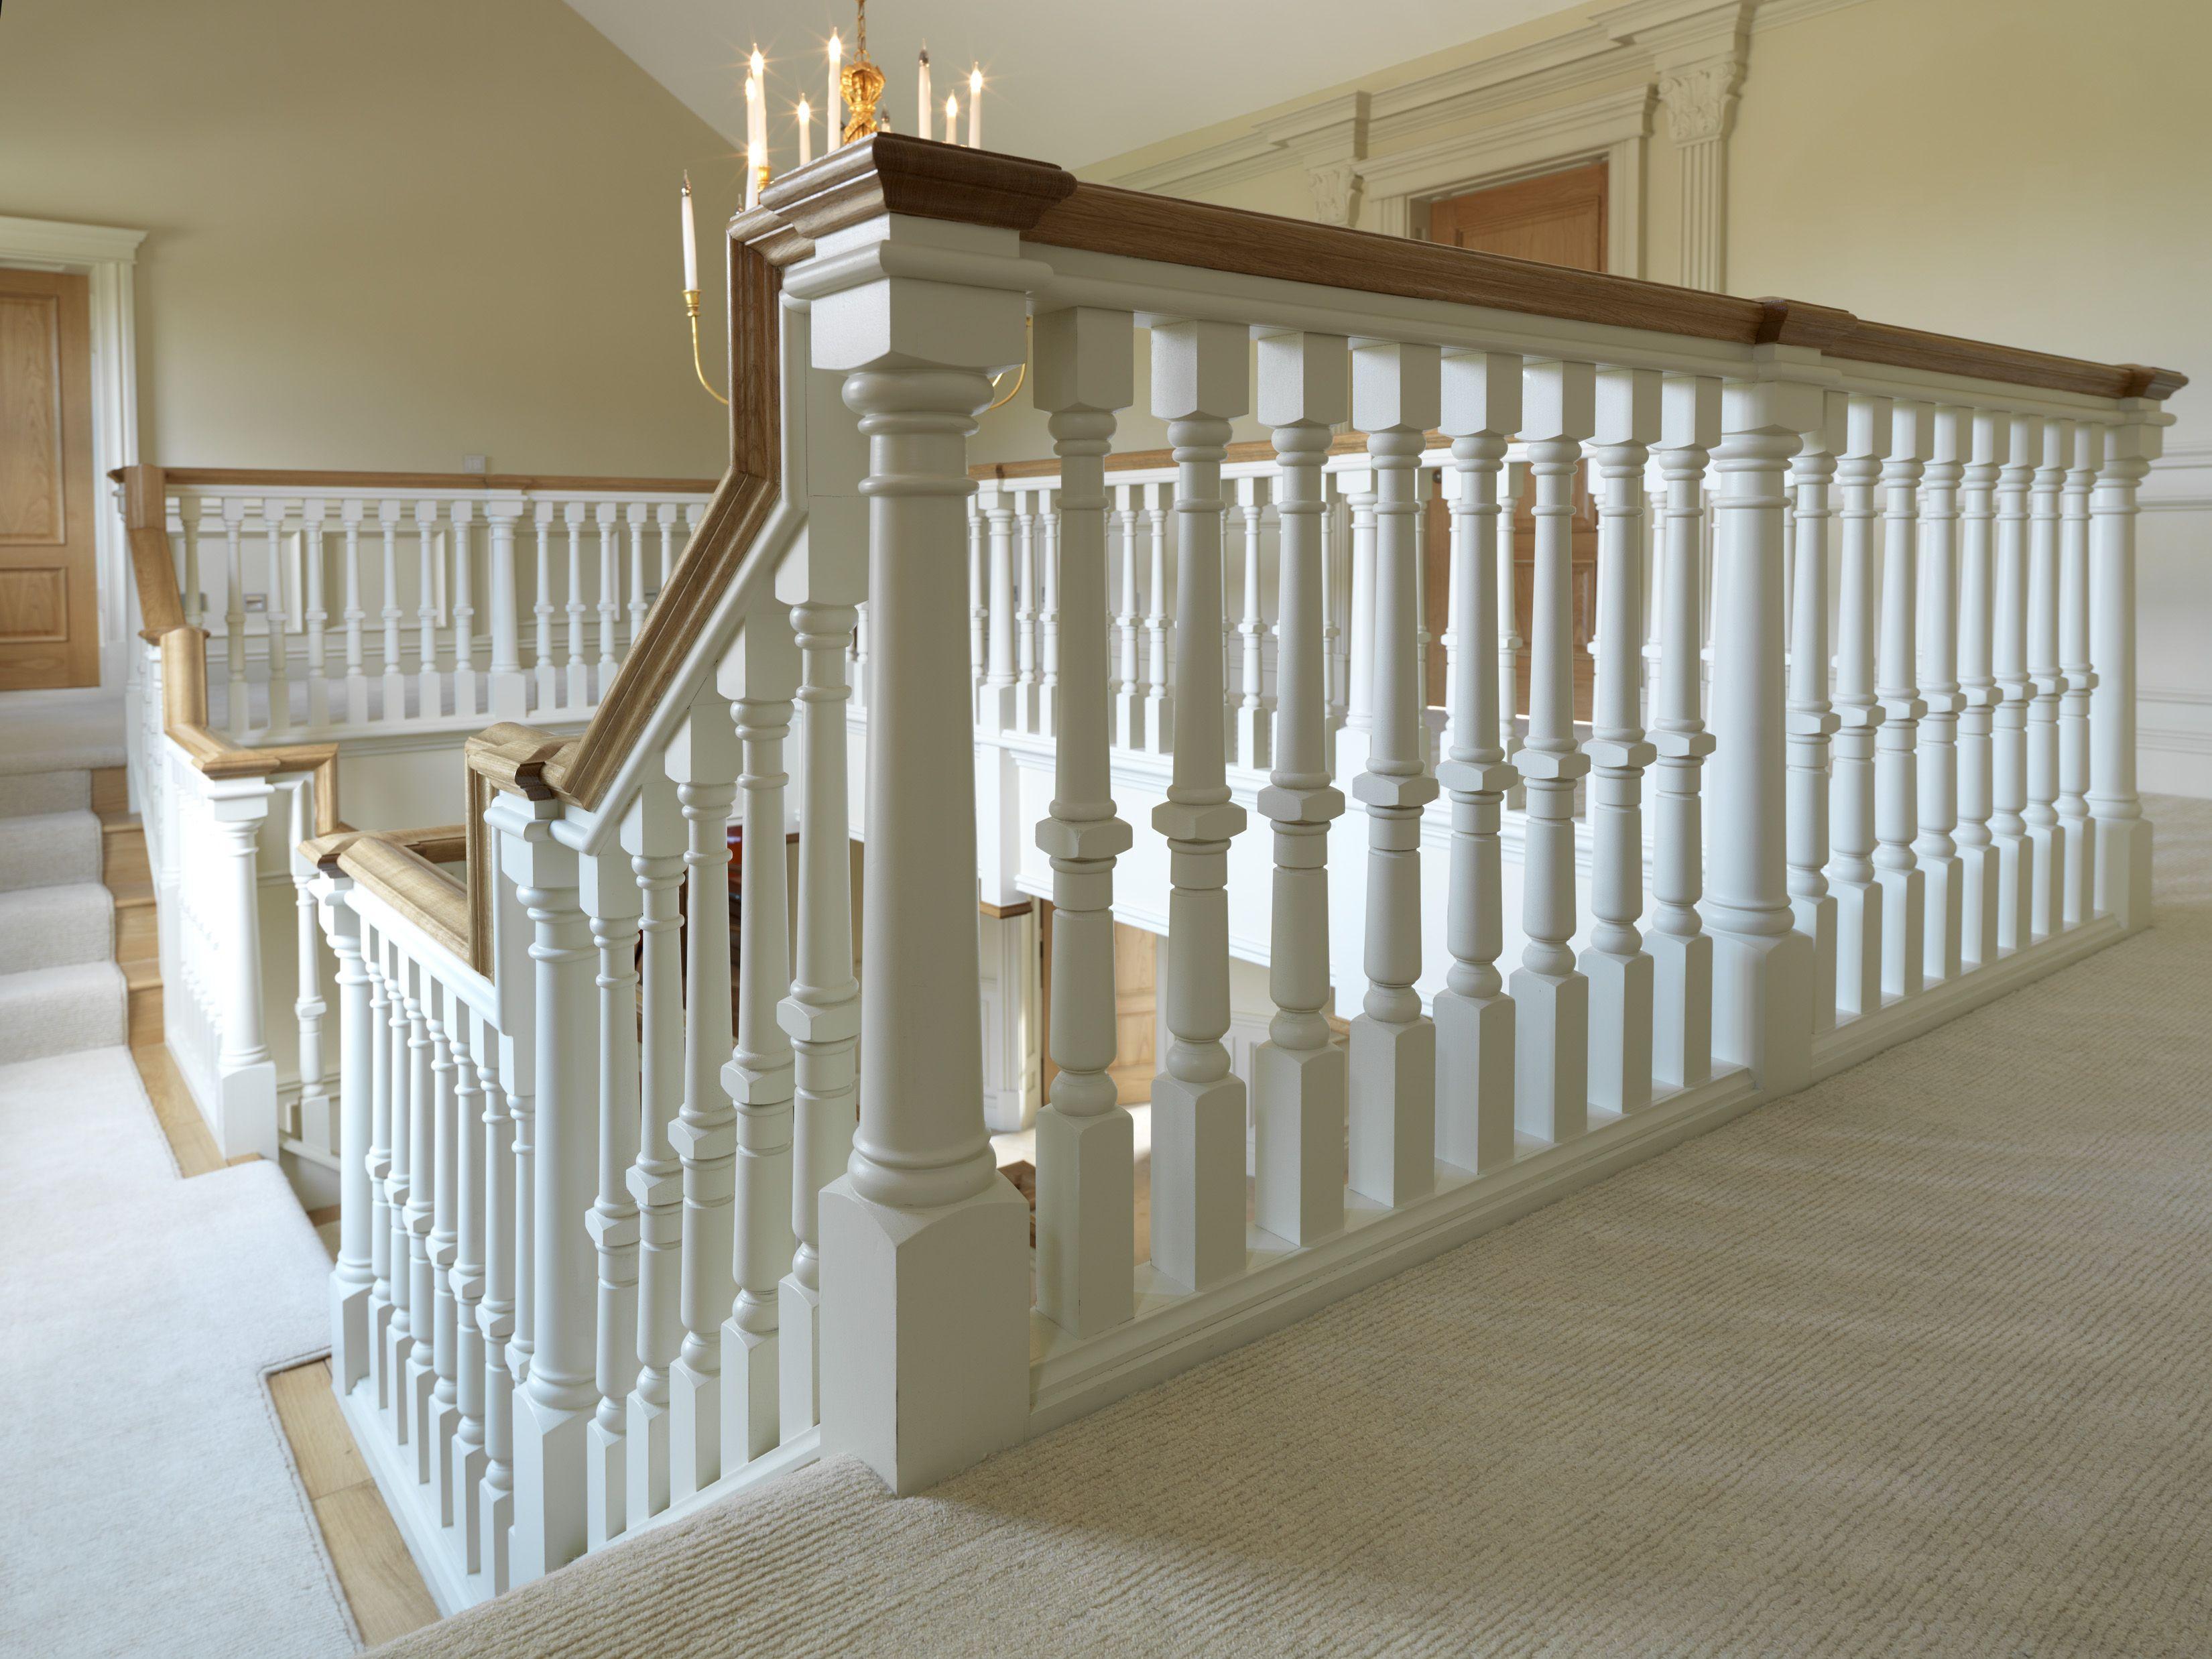 Best Image Result For Stair Spindle Designs Butcher Blocks 400 x 300